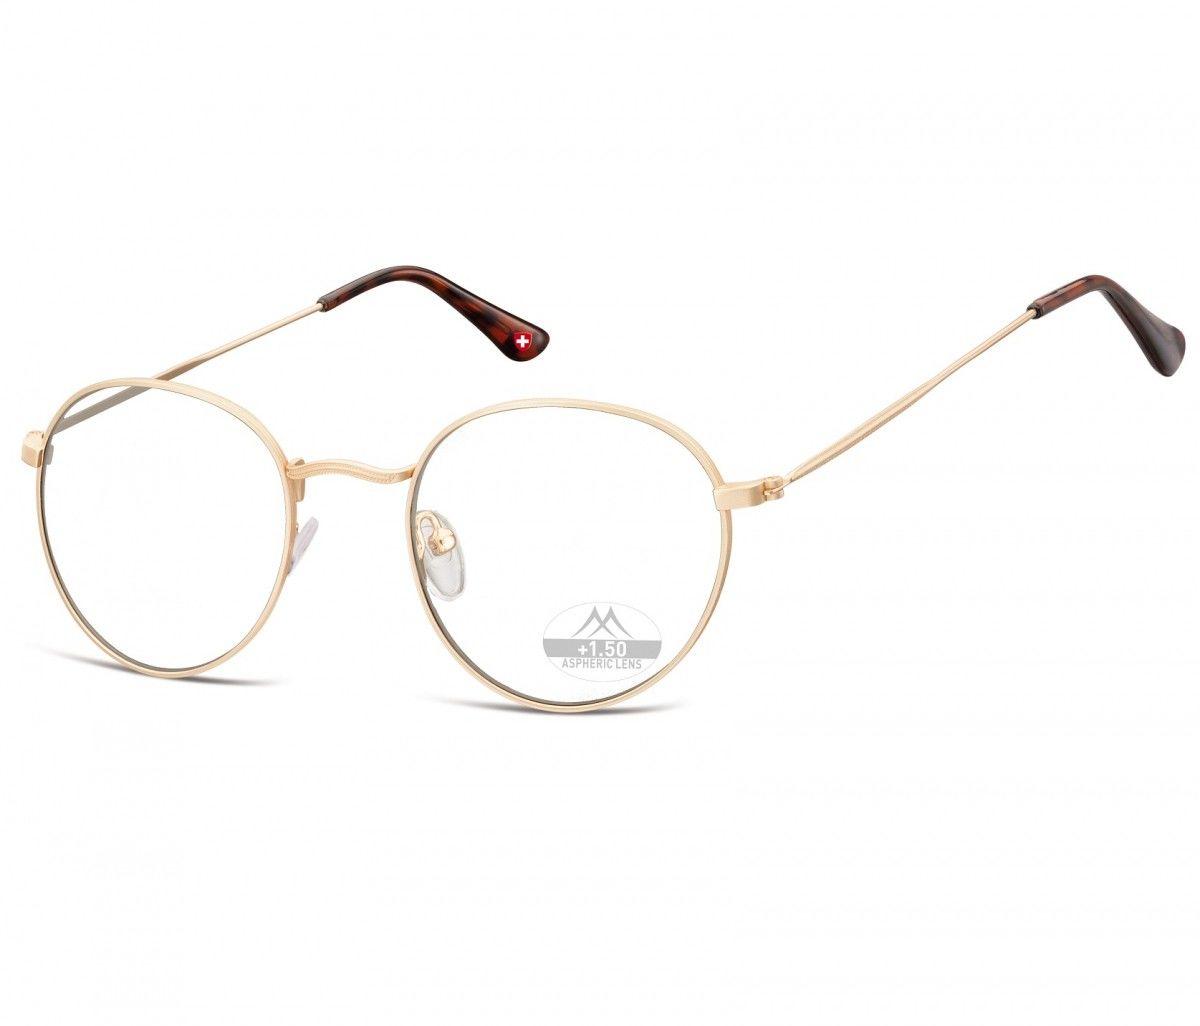 Okulary do Czytania Lenonki asferyczne Montana HMR54A moc: +3,5